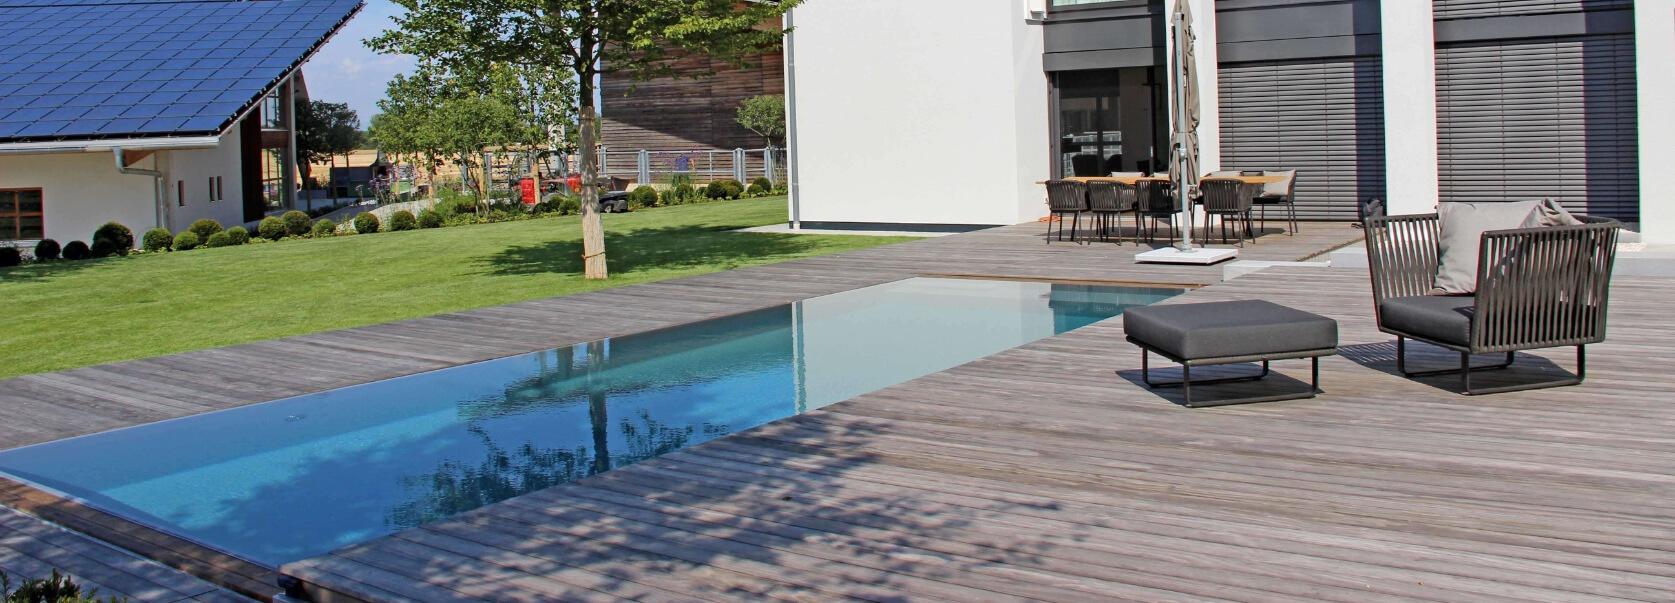 Ettl Pool & Wellness